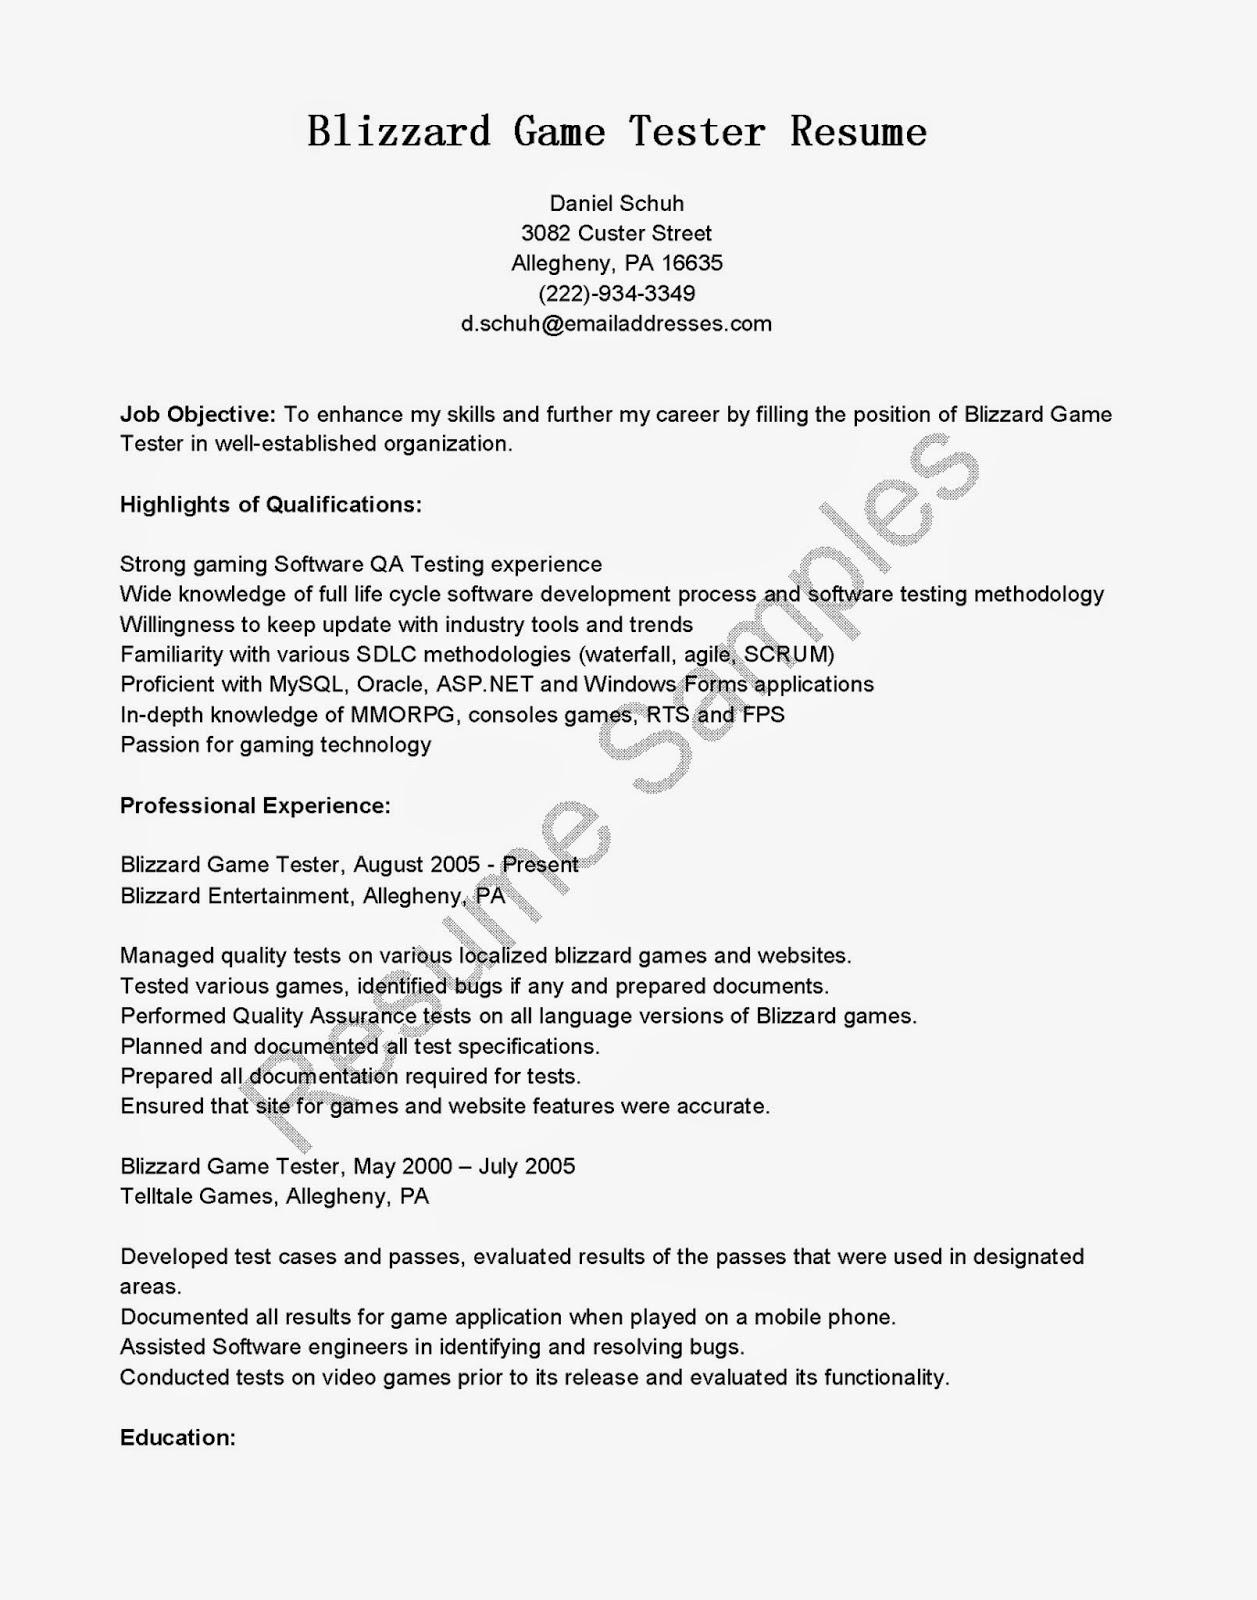 resume samples  blizzard game tester resume